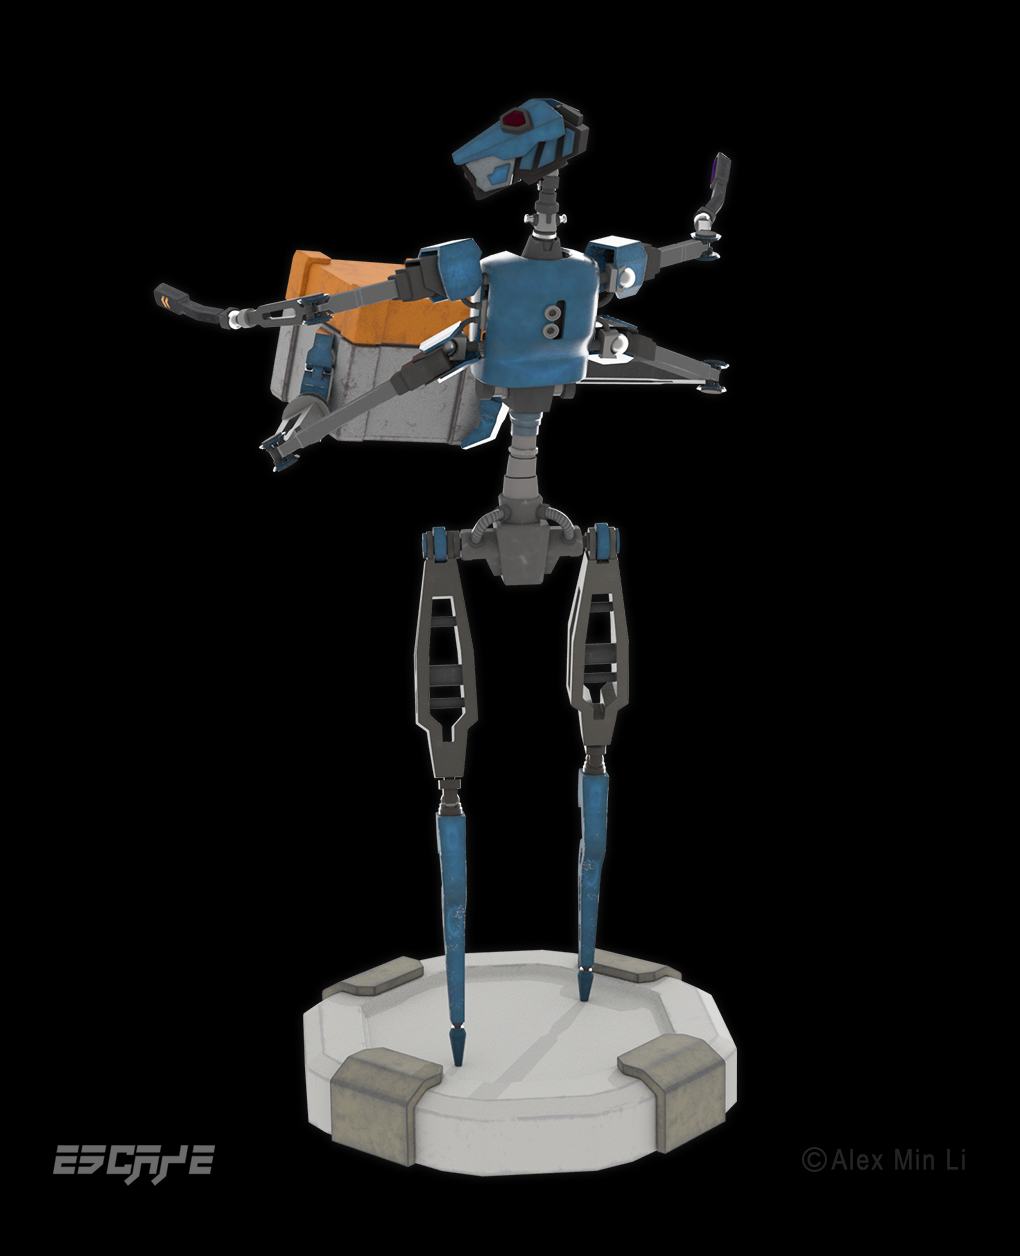 robot_pose2_a